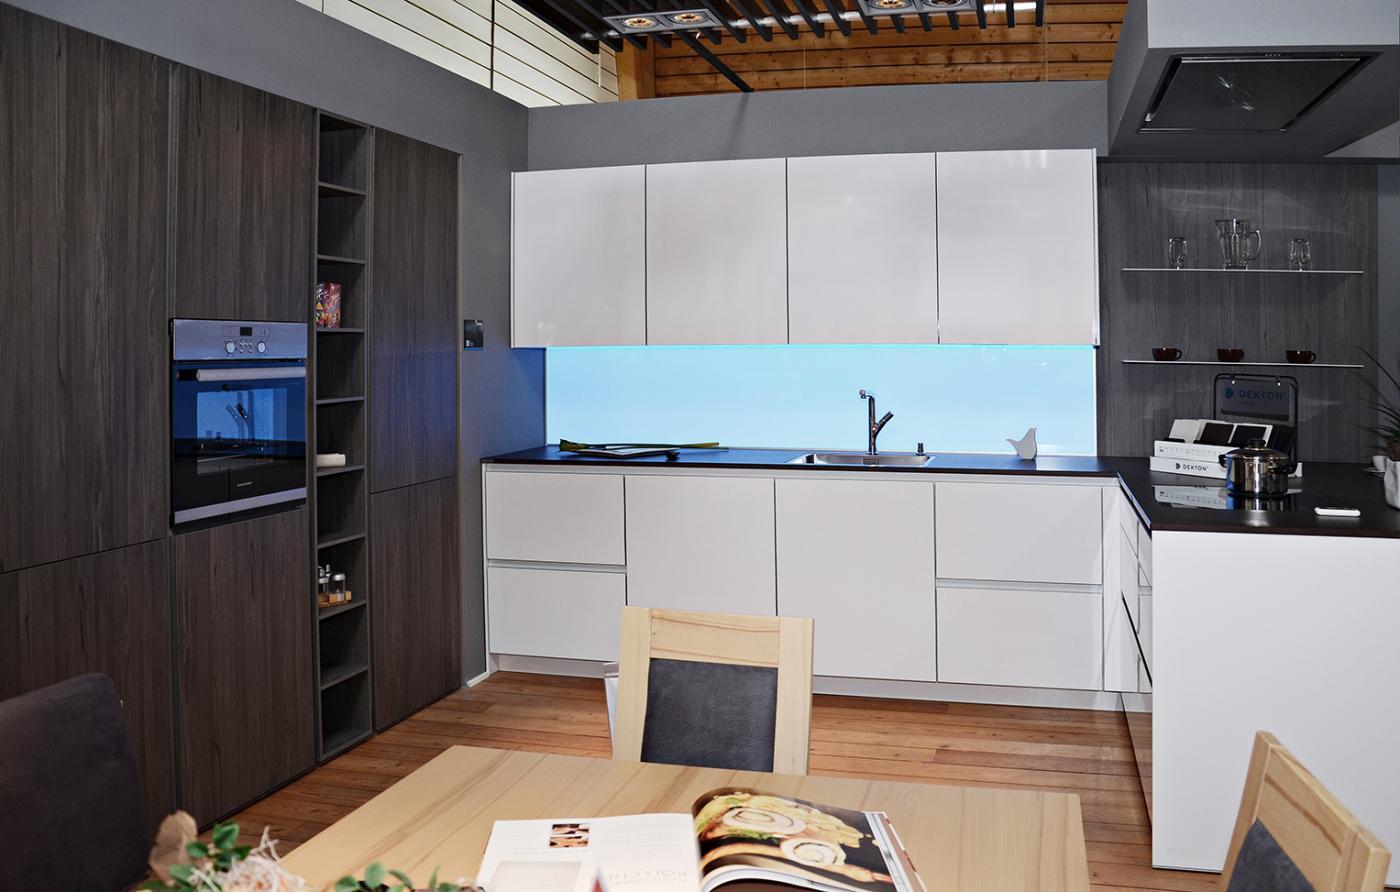 kchen kempten great kchen kempten with kchen kempten brauhfe kempten ihre neue adresse neubau. Black Bedroom Furniture Sets. Home Design Ideas